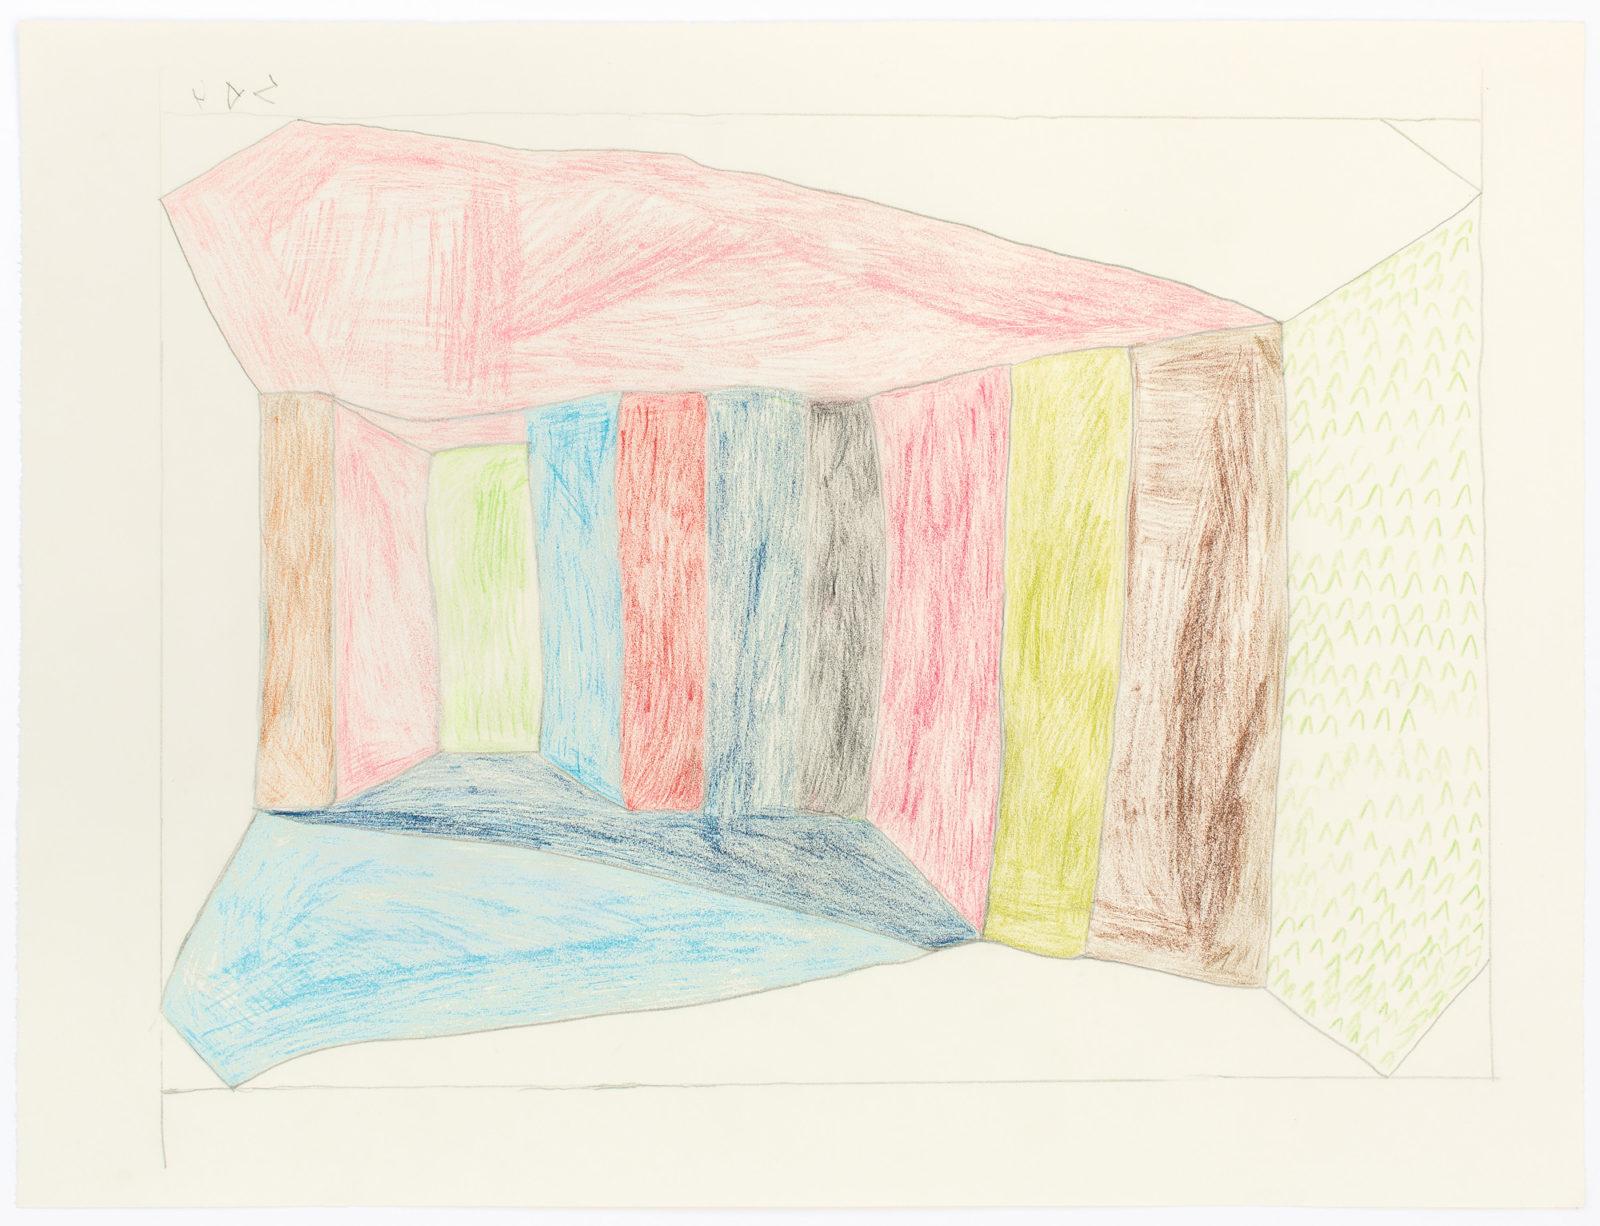 Sheojuk Etidlooie - untitled (composition)